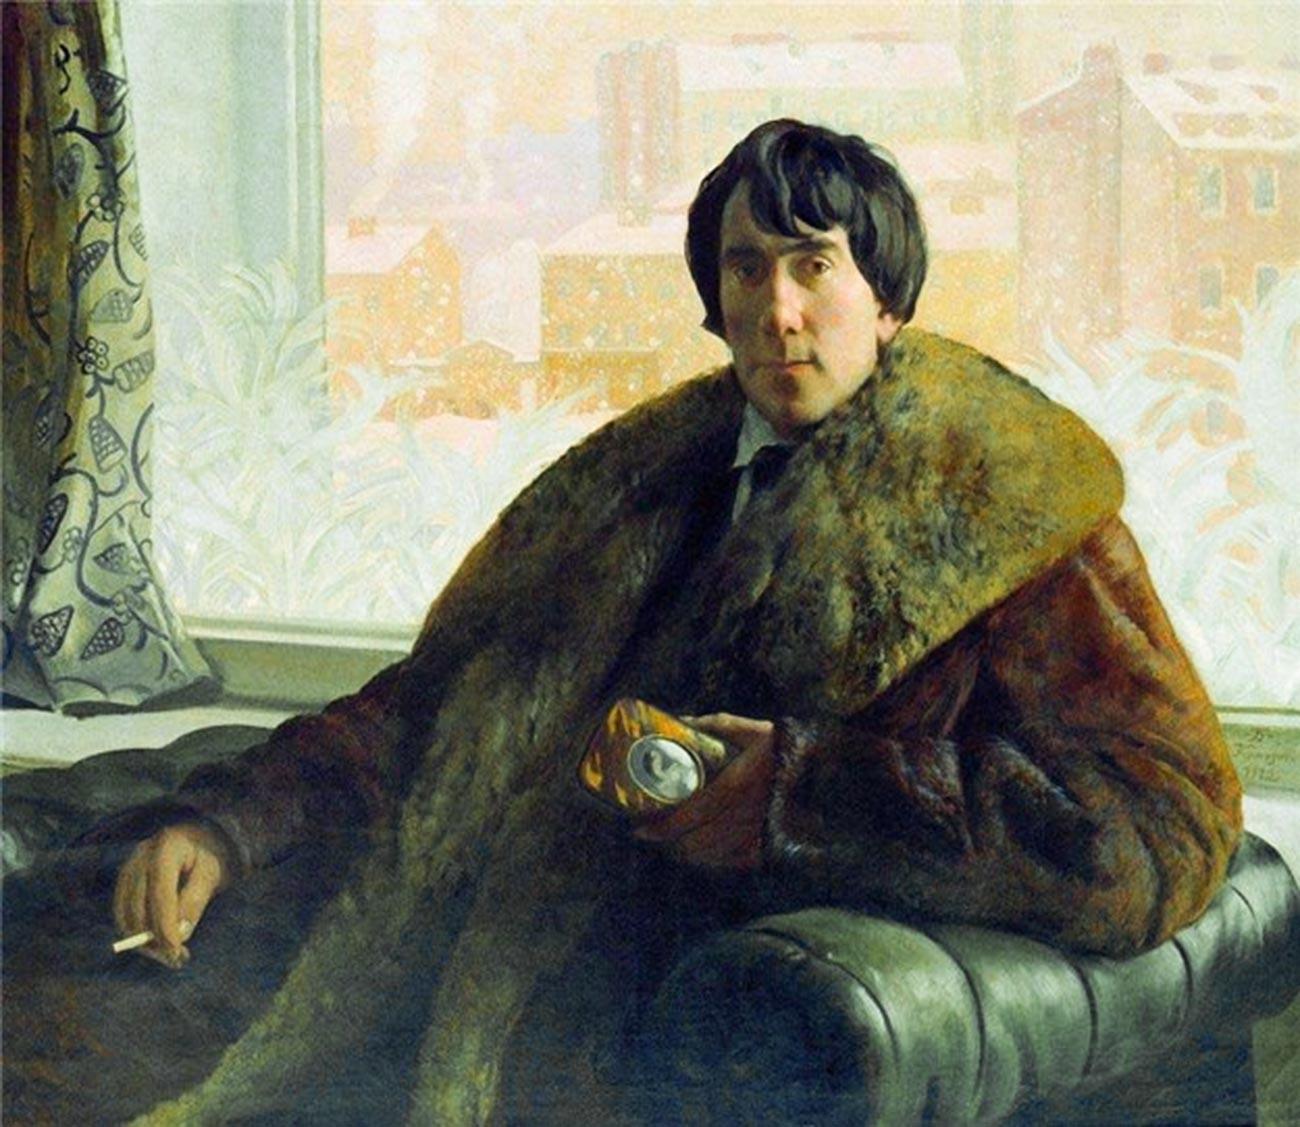 'Potret pematung dan arsitek I. S. Zolotarevsky,' 1922, oleh Boris Kustodiev.